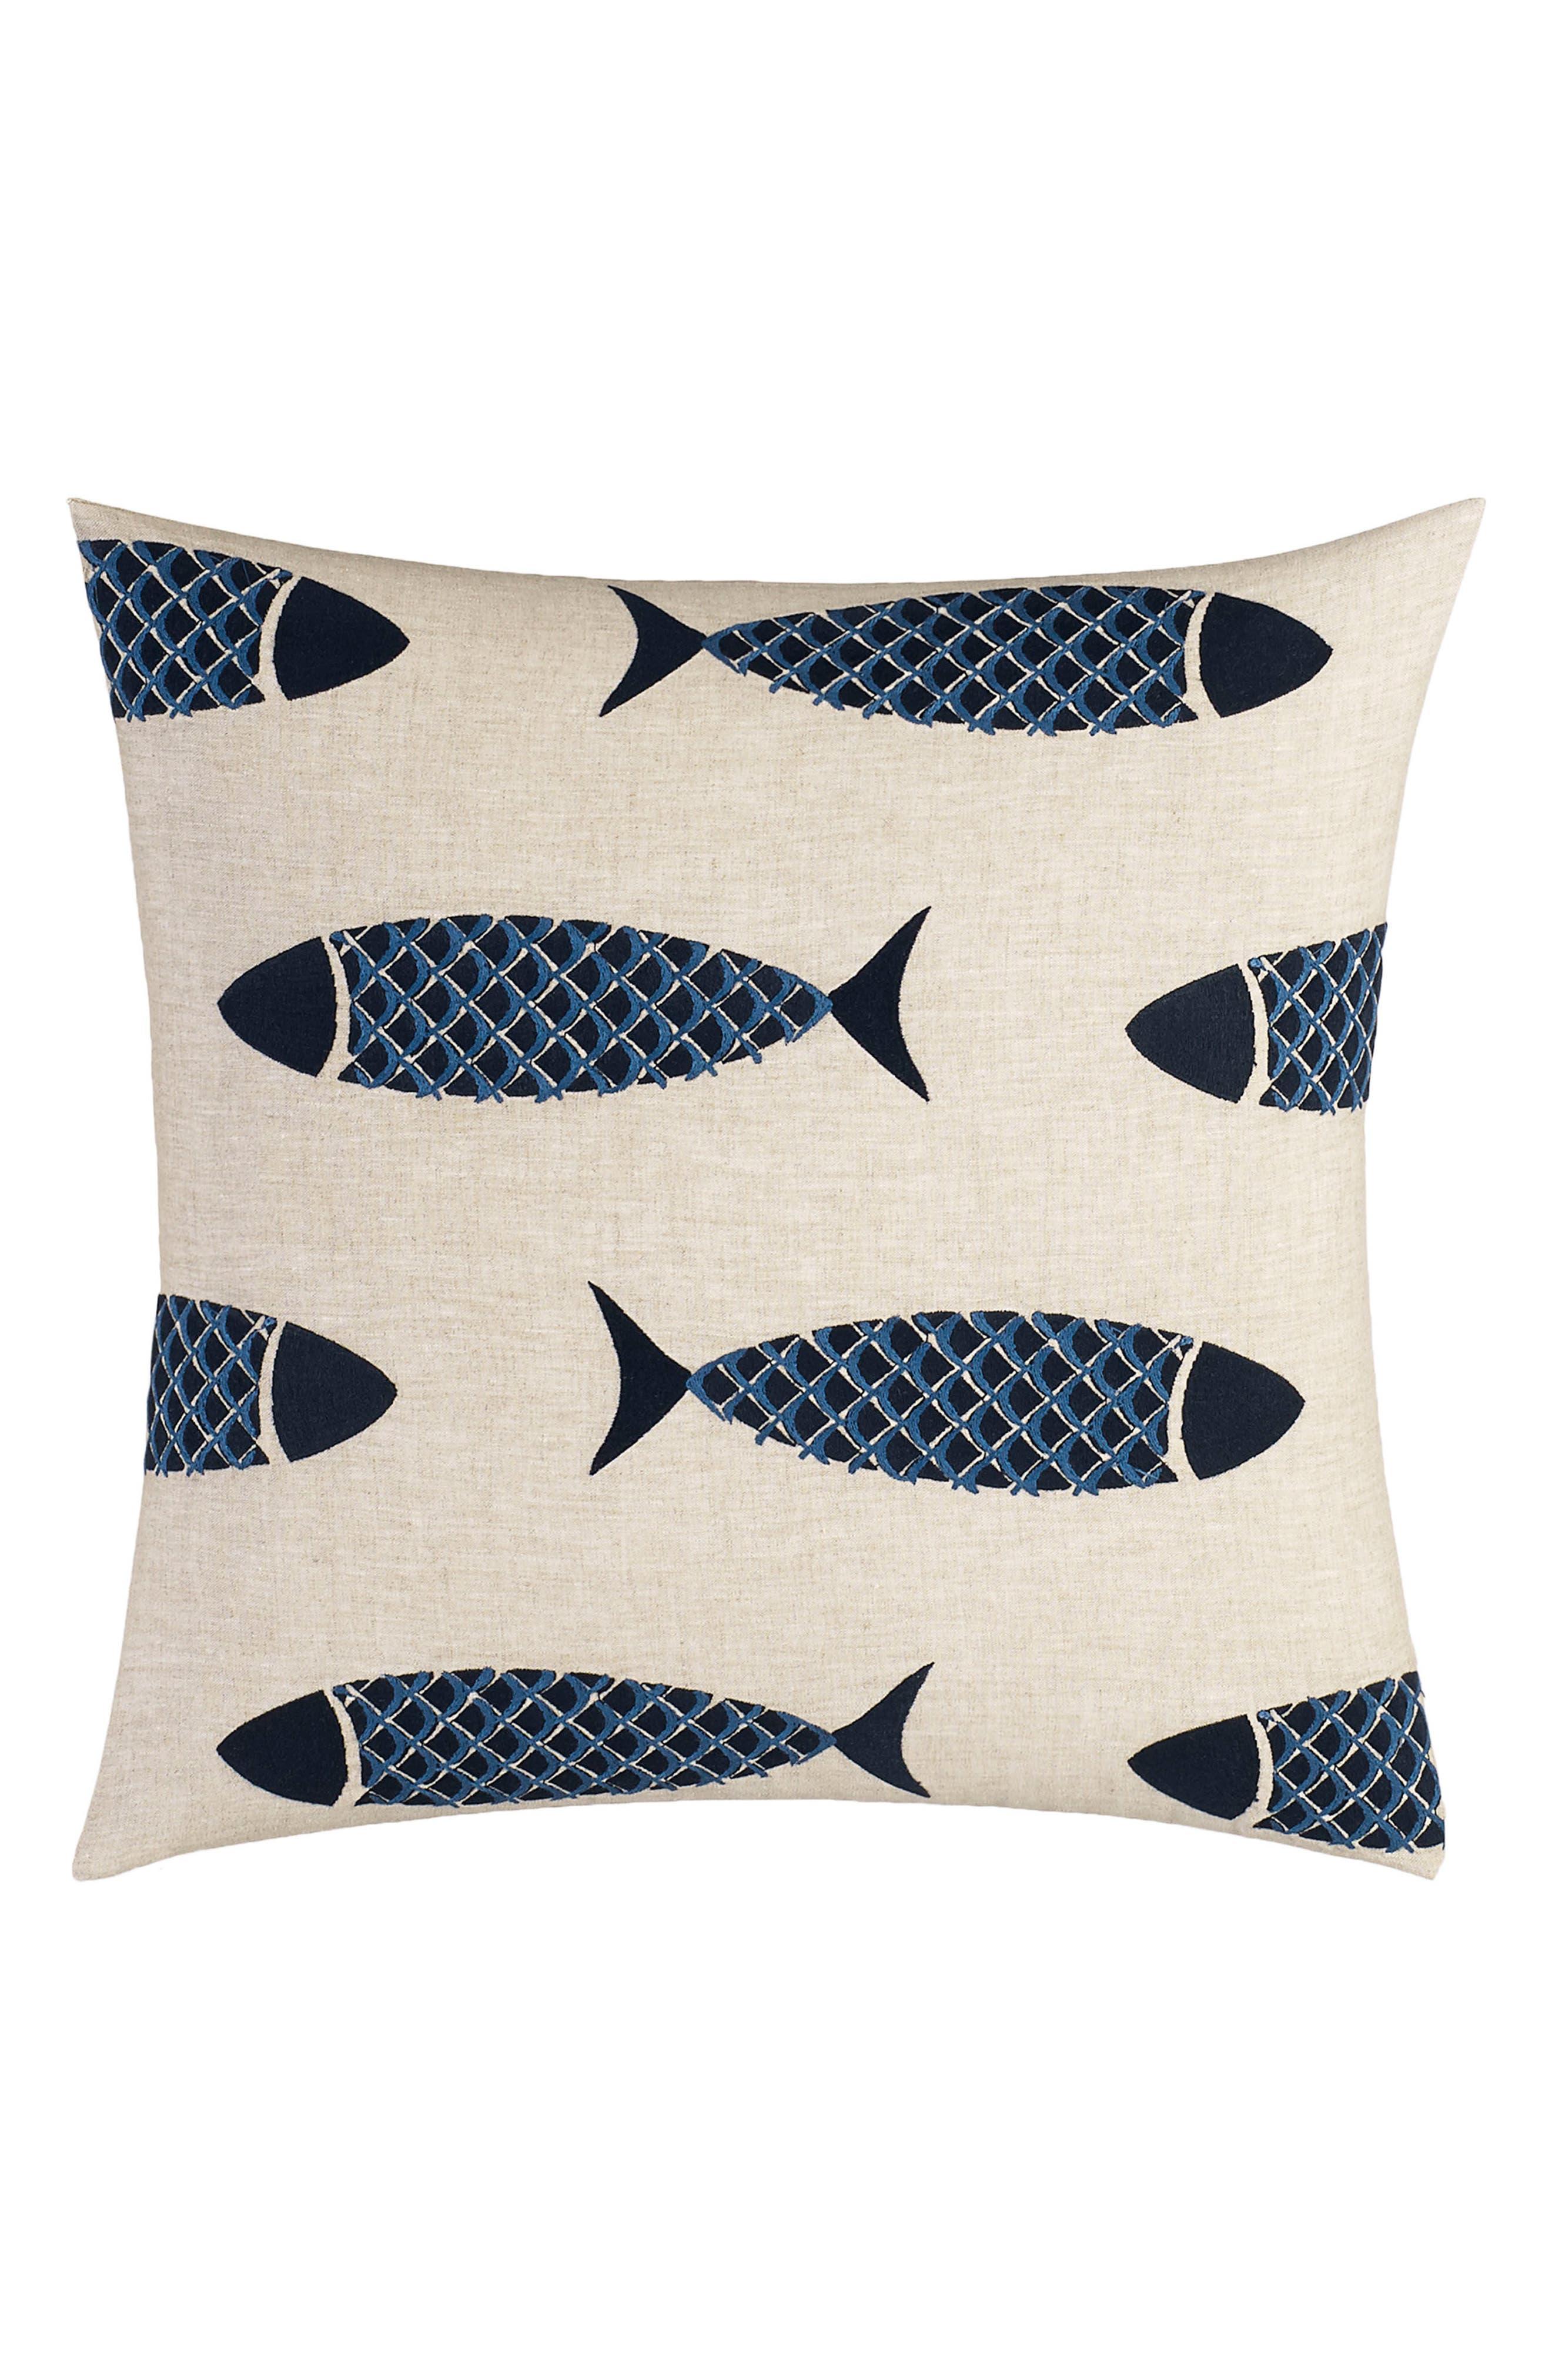 Alternate Image 1 Selected - Nautica Lockridge Embroidered Pillow